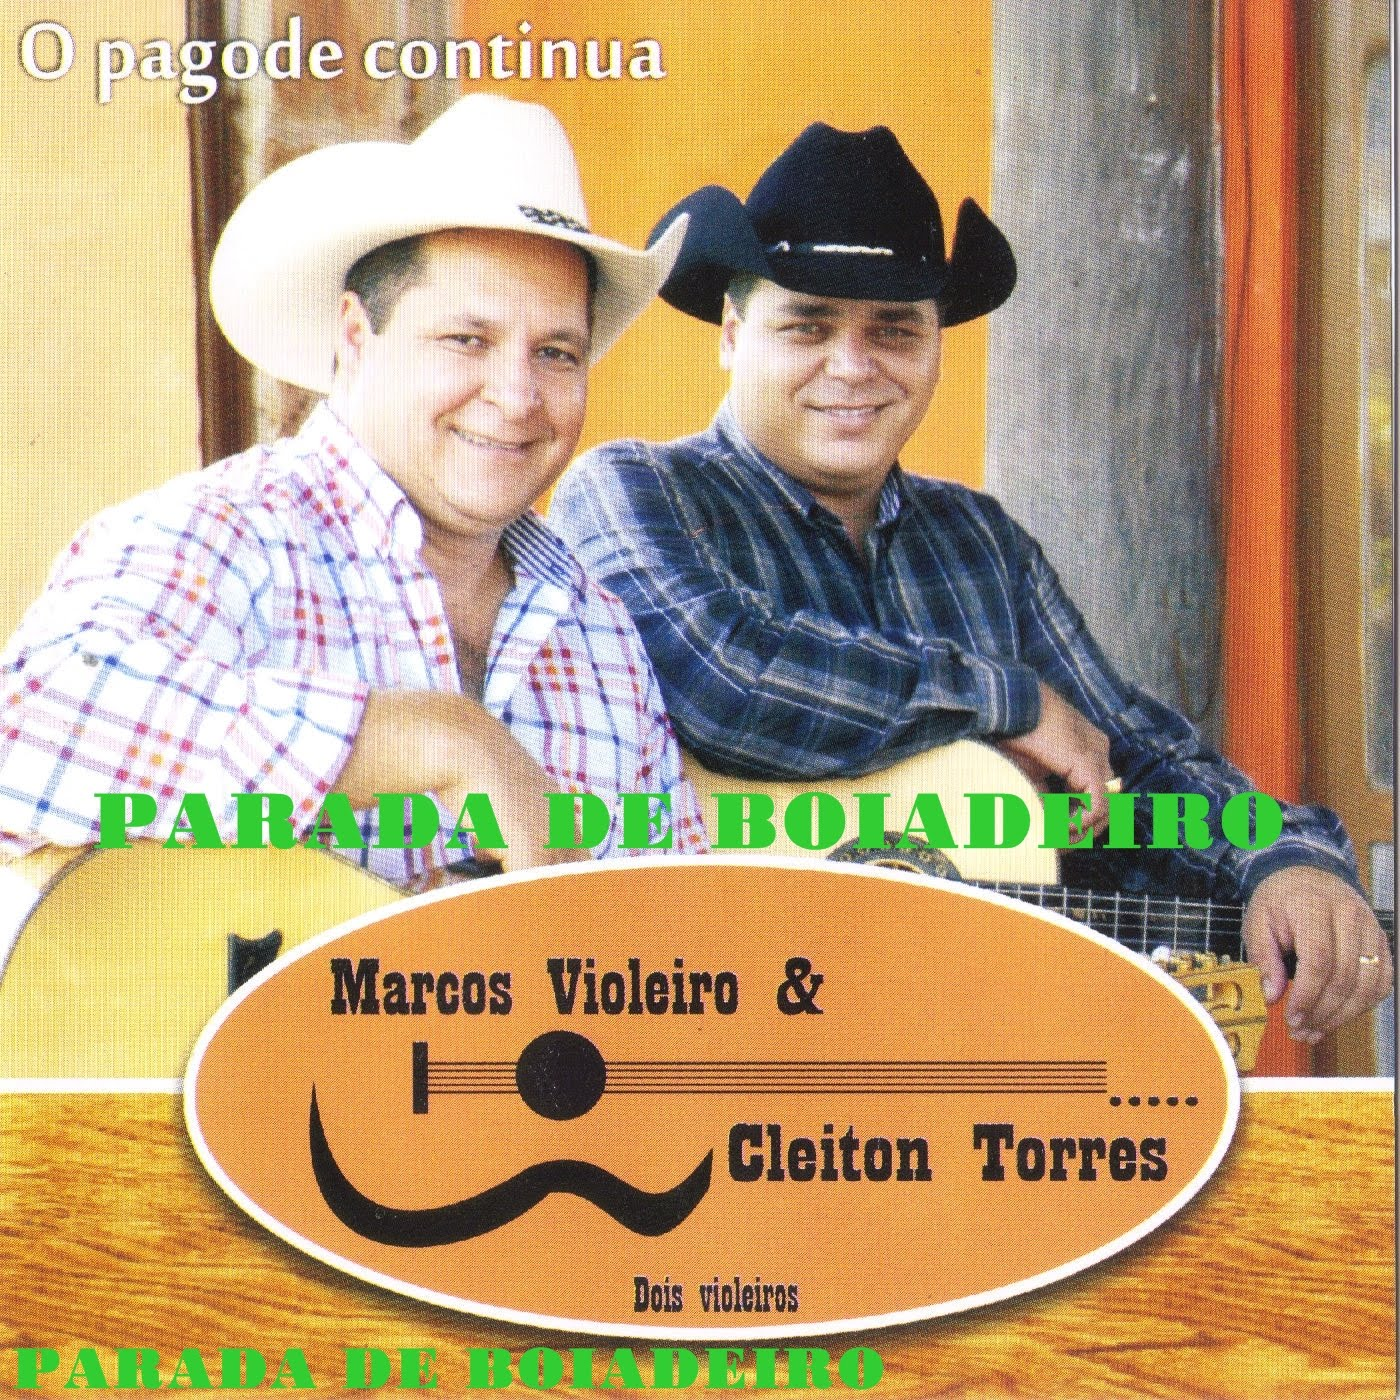 PARAISO SERTANEJO: MARCOS VIOLEIRO E CLEITON TORRES 2010 #A98722 1400x1400